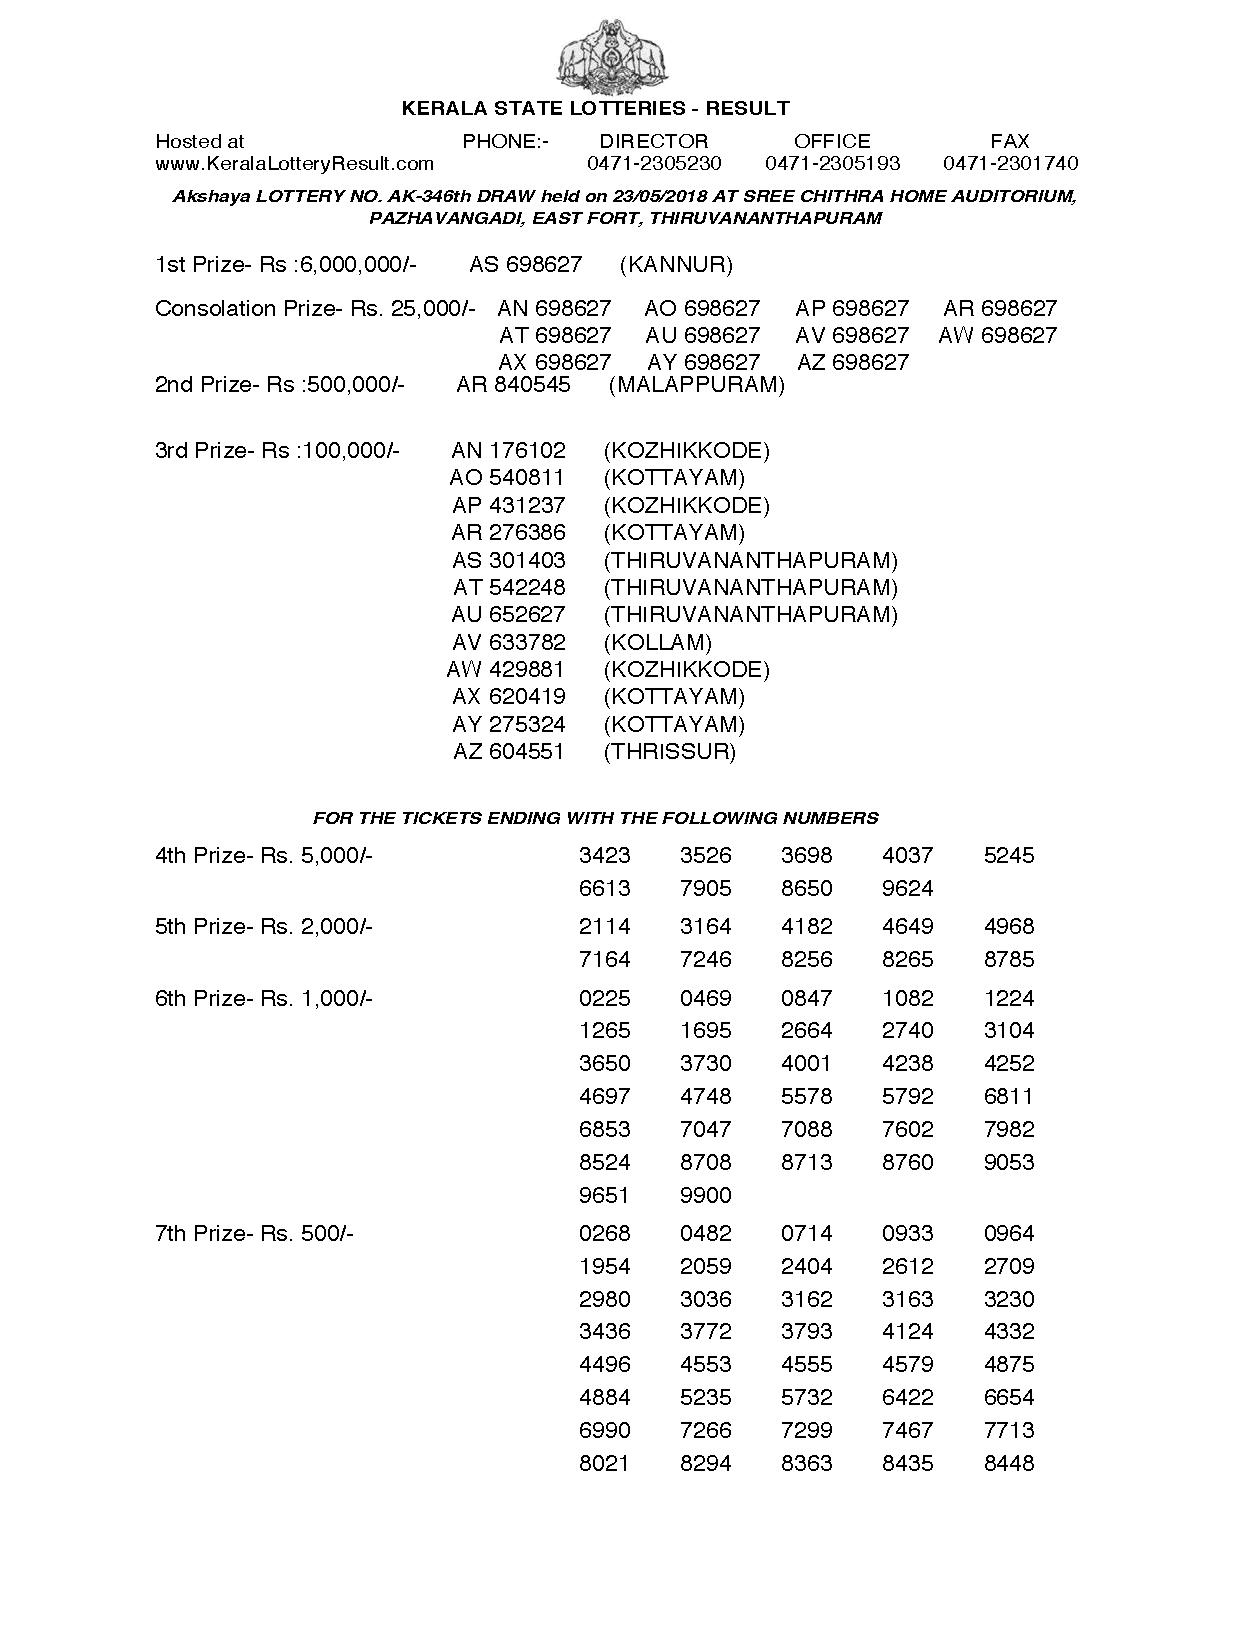 Akshaya AK346 Kerala Lottery Results Screenshot: Page 1